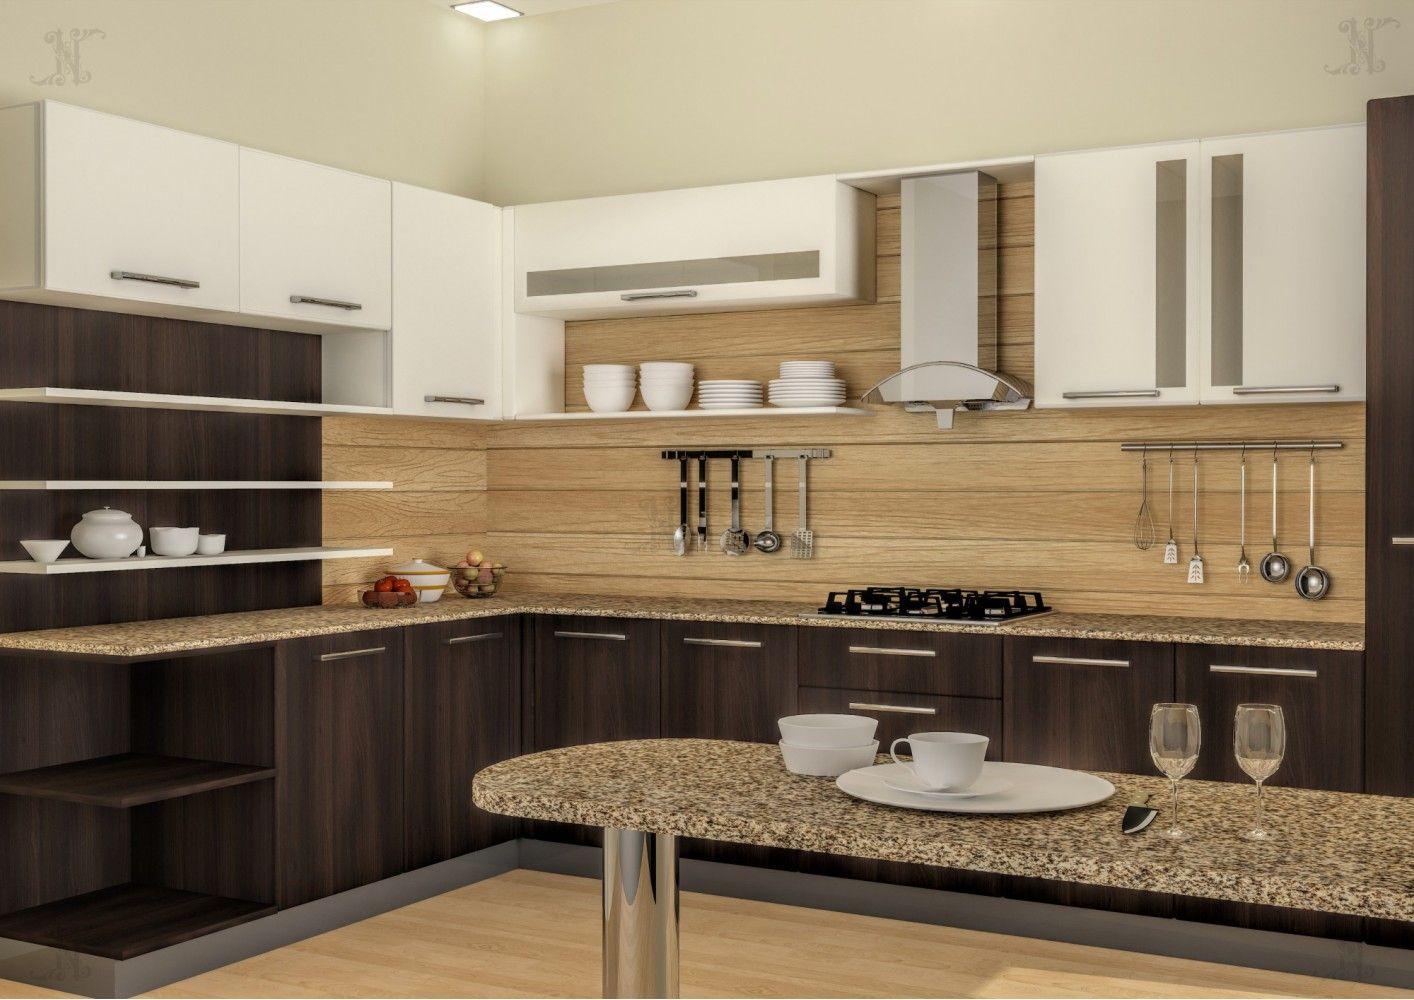 Cortesa l shape modular kitchen ideas for the house for Modular kitchen designs catalogue